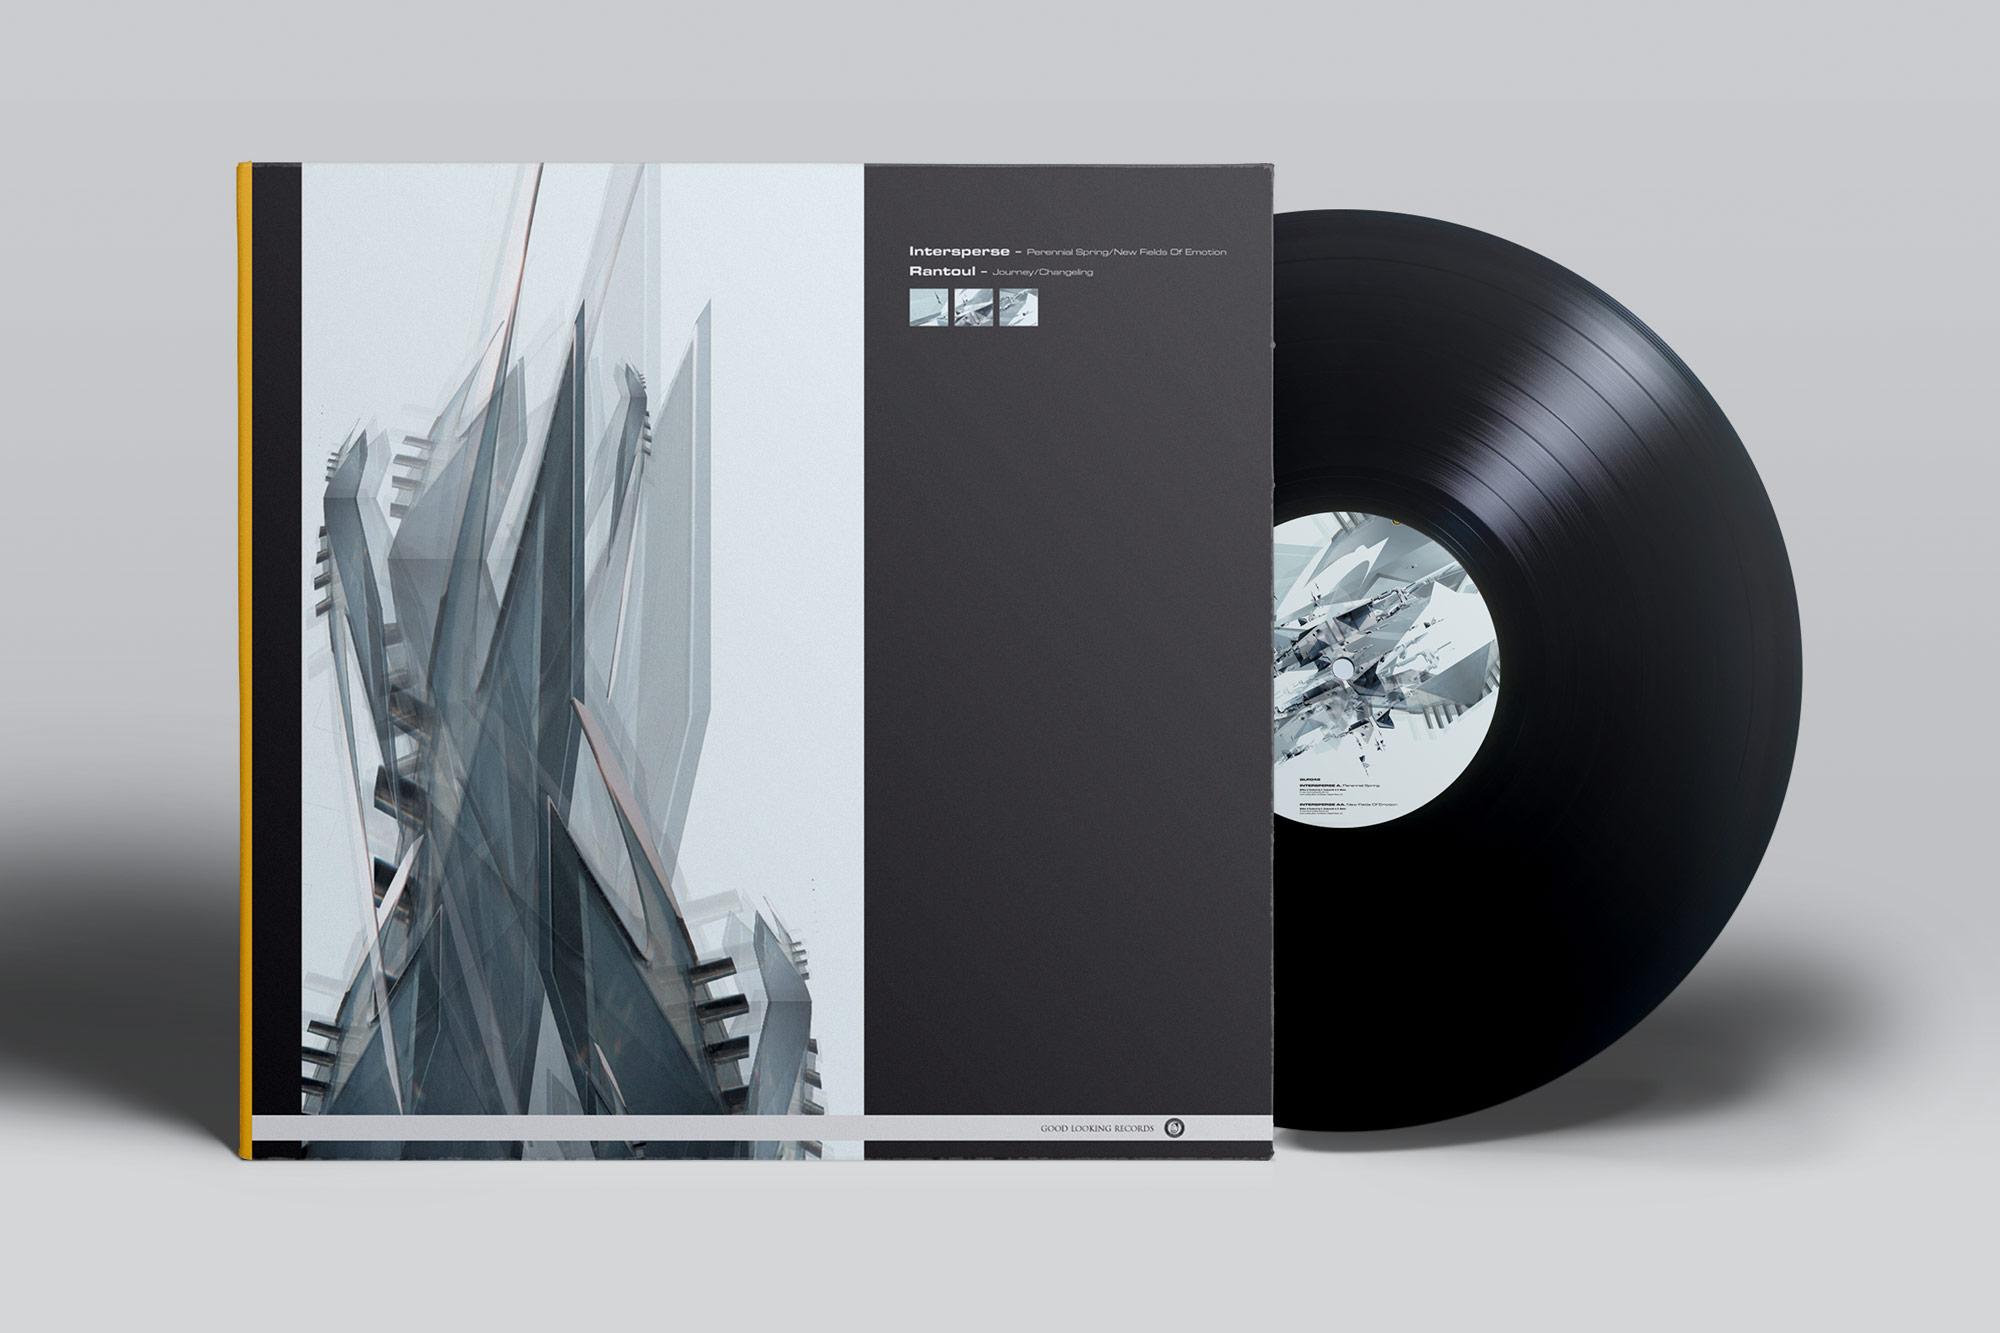 gareth-paul-jones-studio-design-good-looking-records-12-covers-cs-02-GLR042